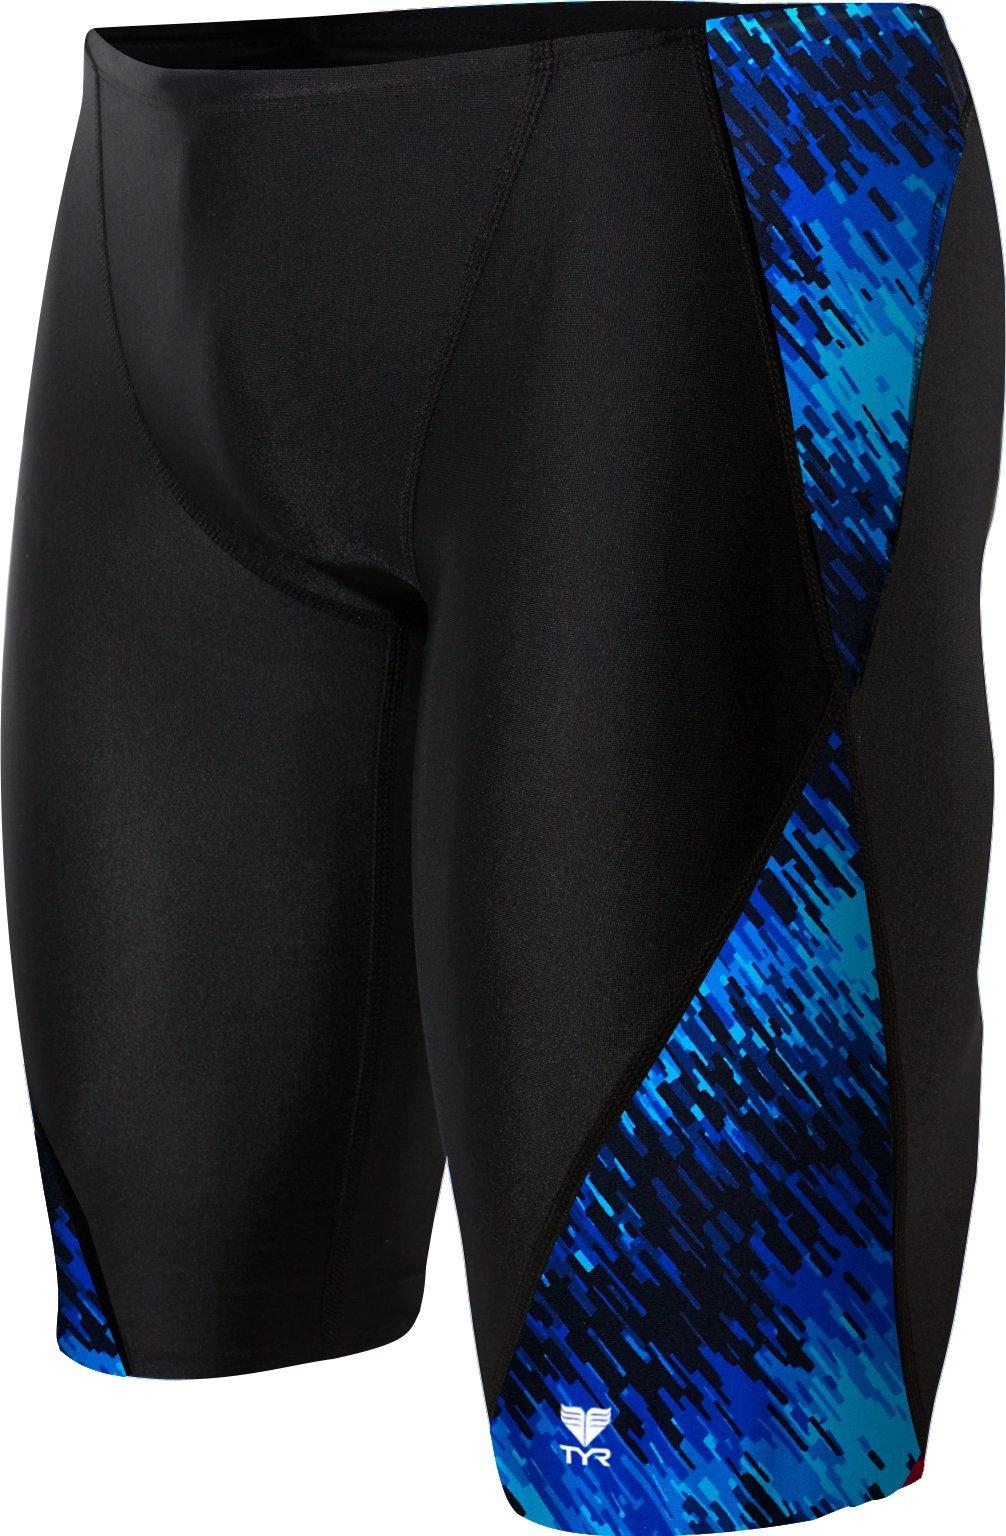 TYR Men's Perseus Jammer Swimsuit, Blue, 30